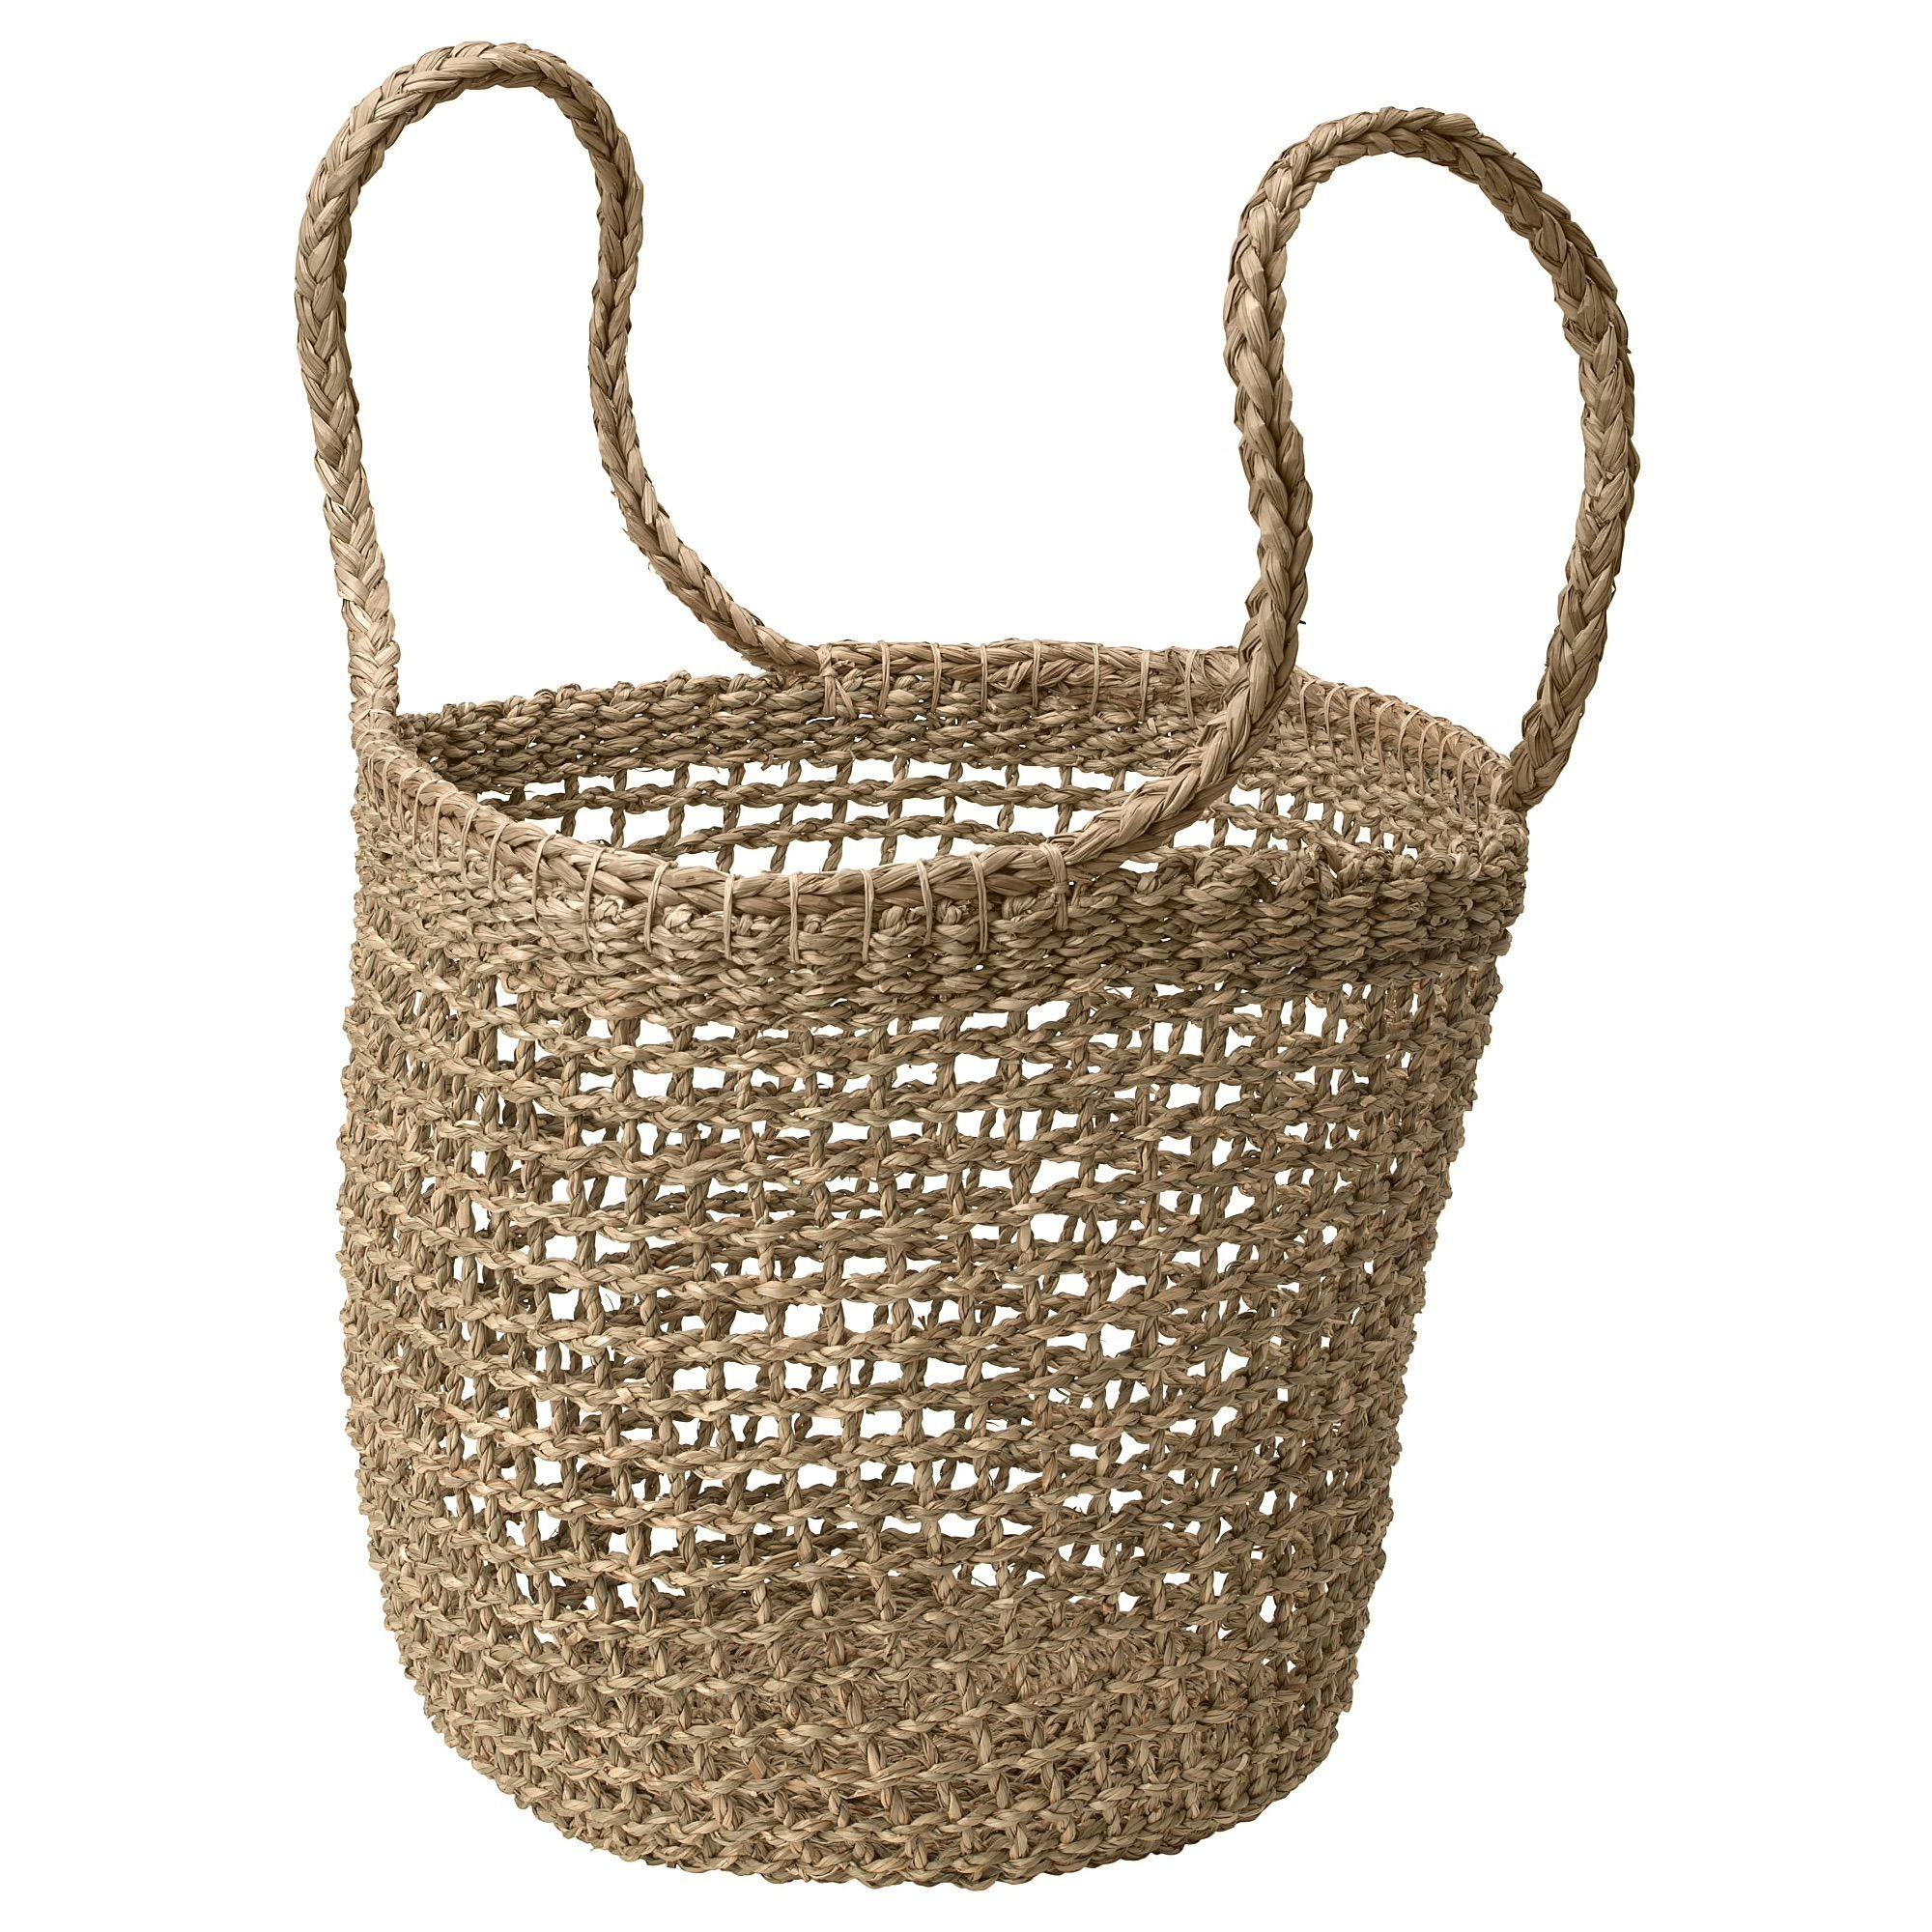 TÄNKVÄRD Seagrass Basket with Handles